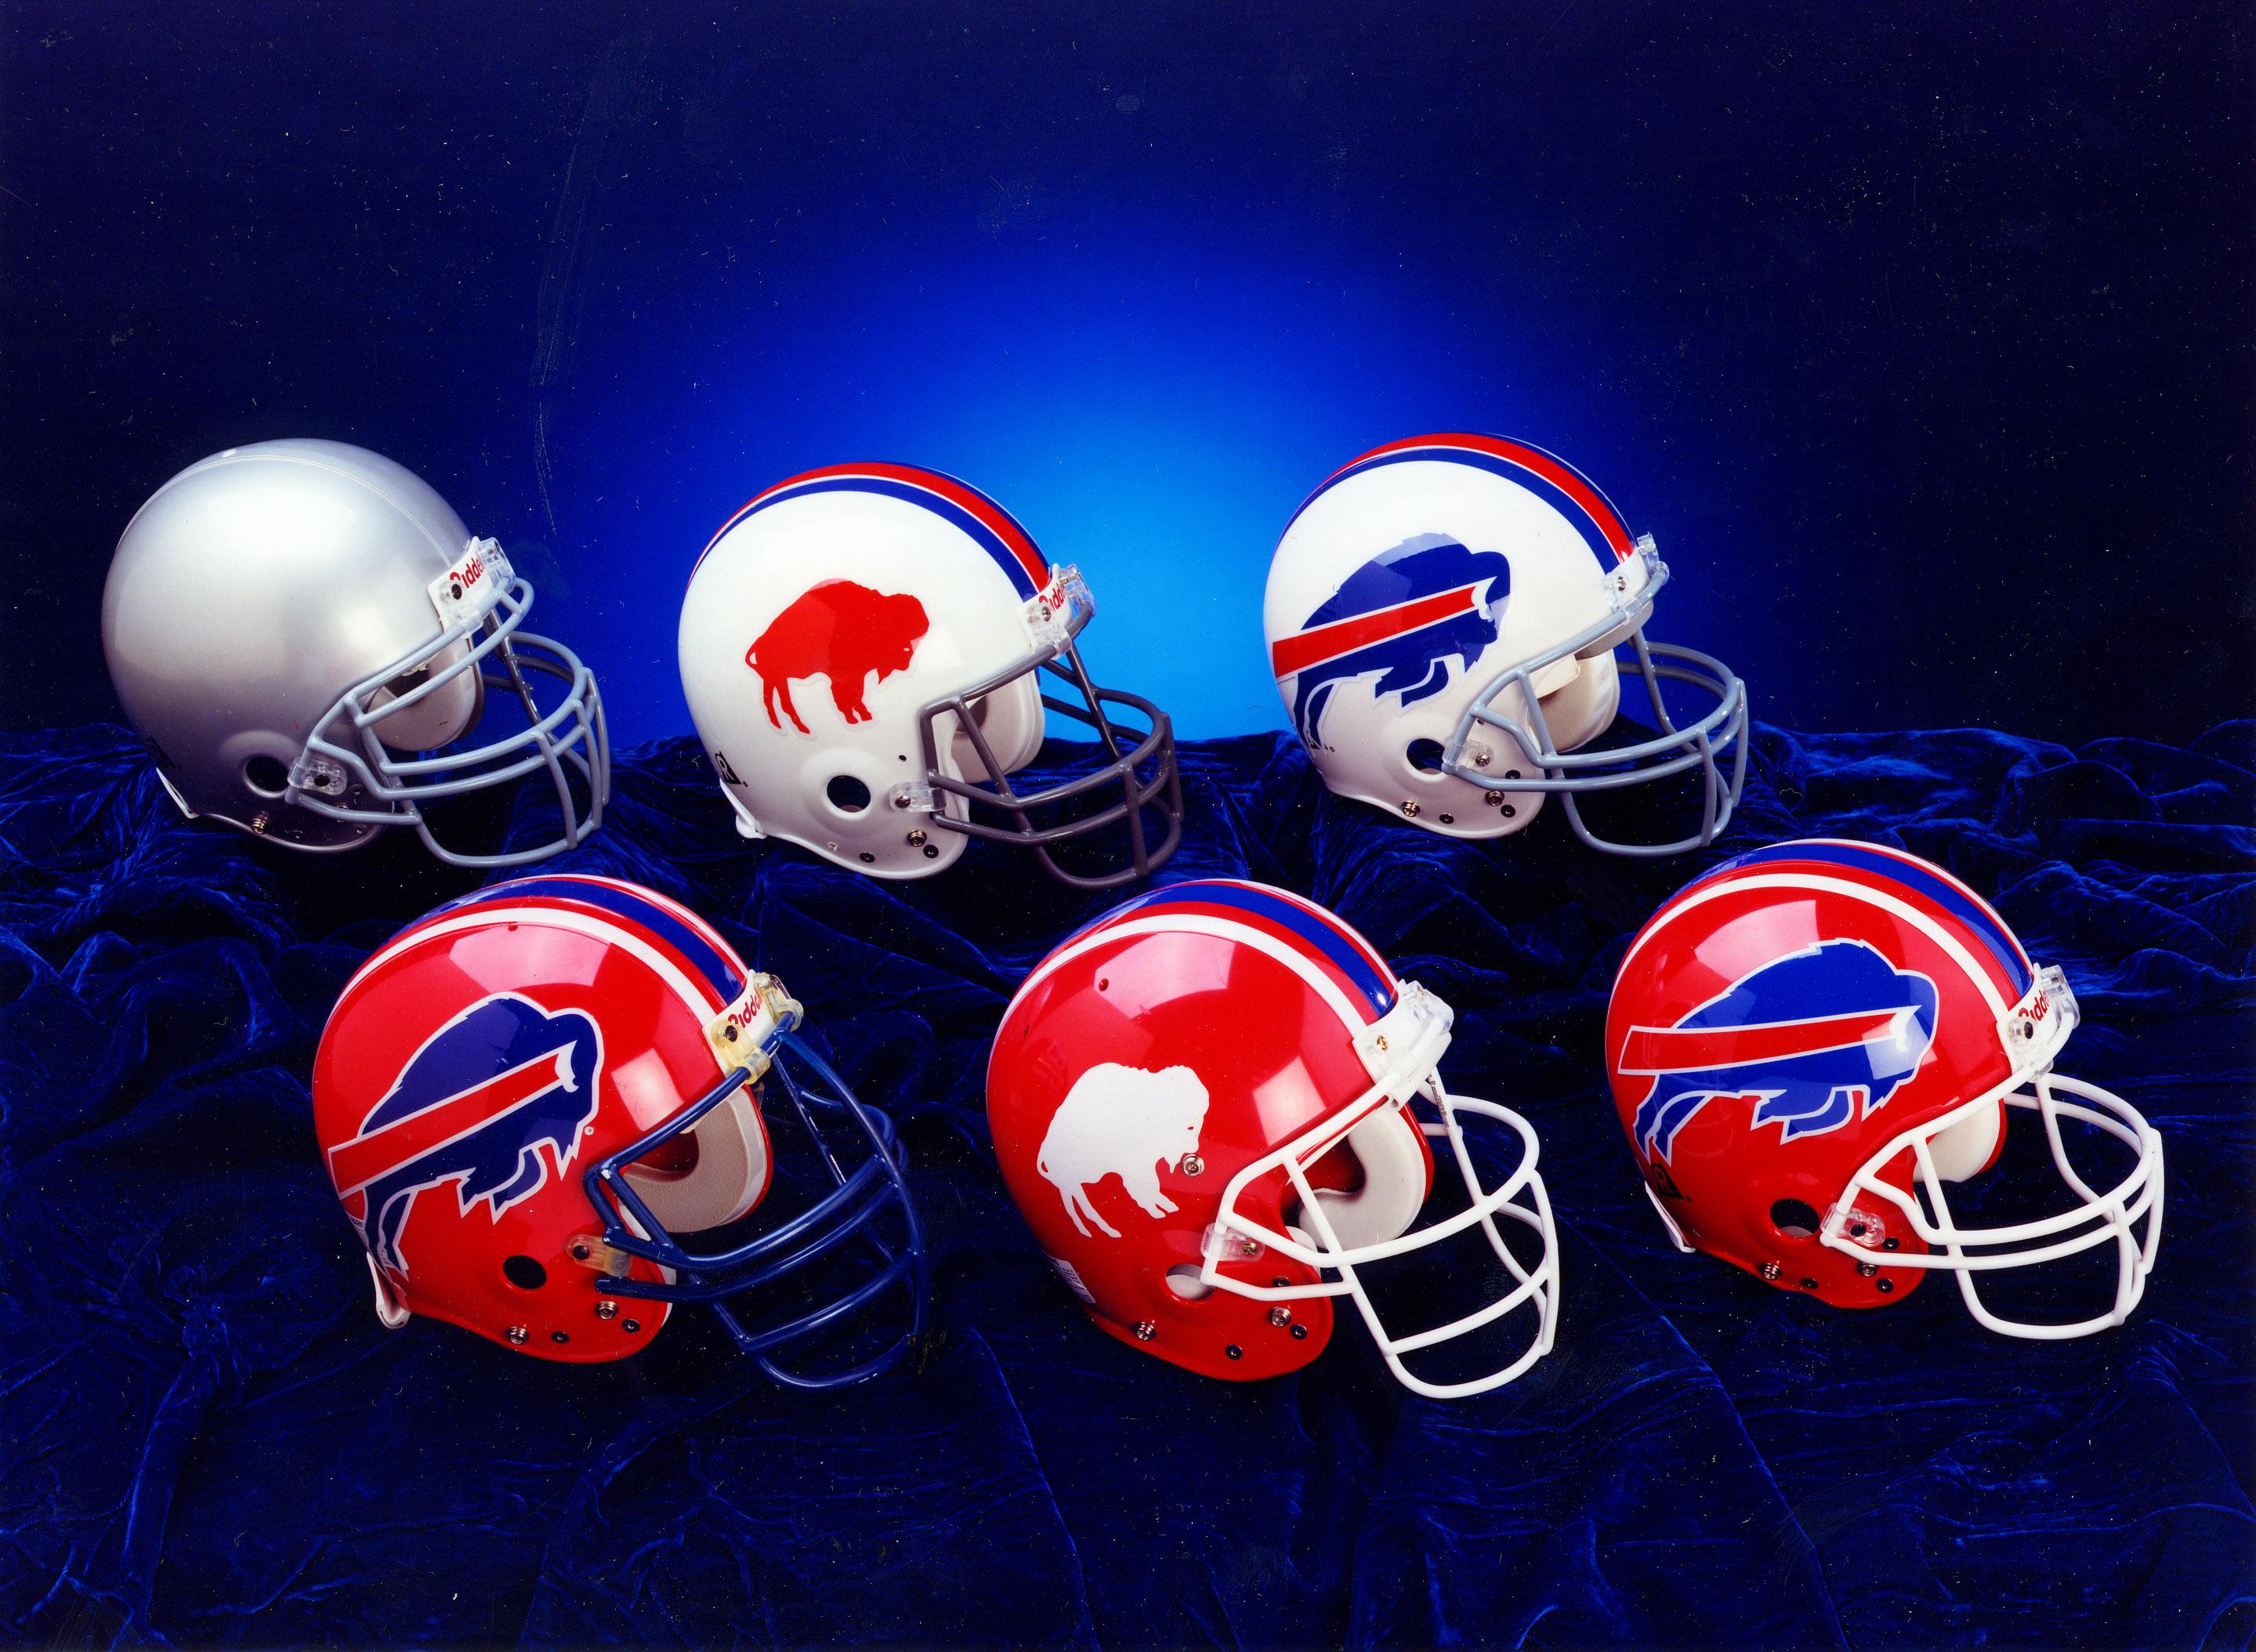 Buffalo Bills Helmet Wallpaper - WallpaperSafari